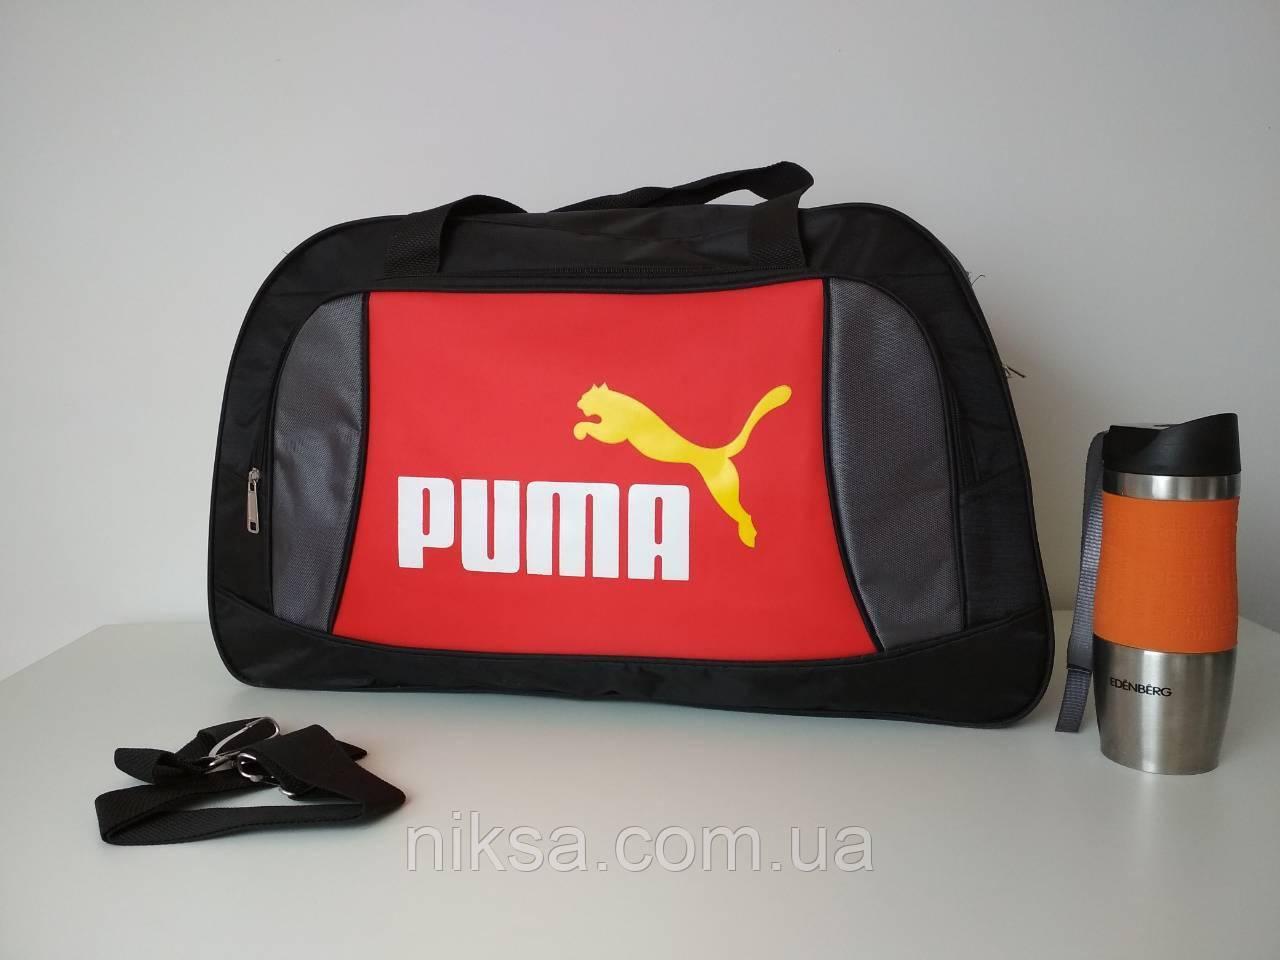 Сумка спорт, дорожная Puma размер 55x35x20